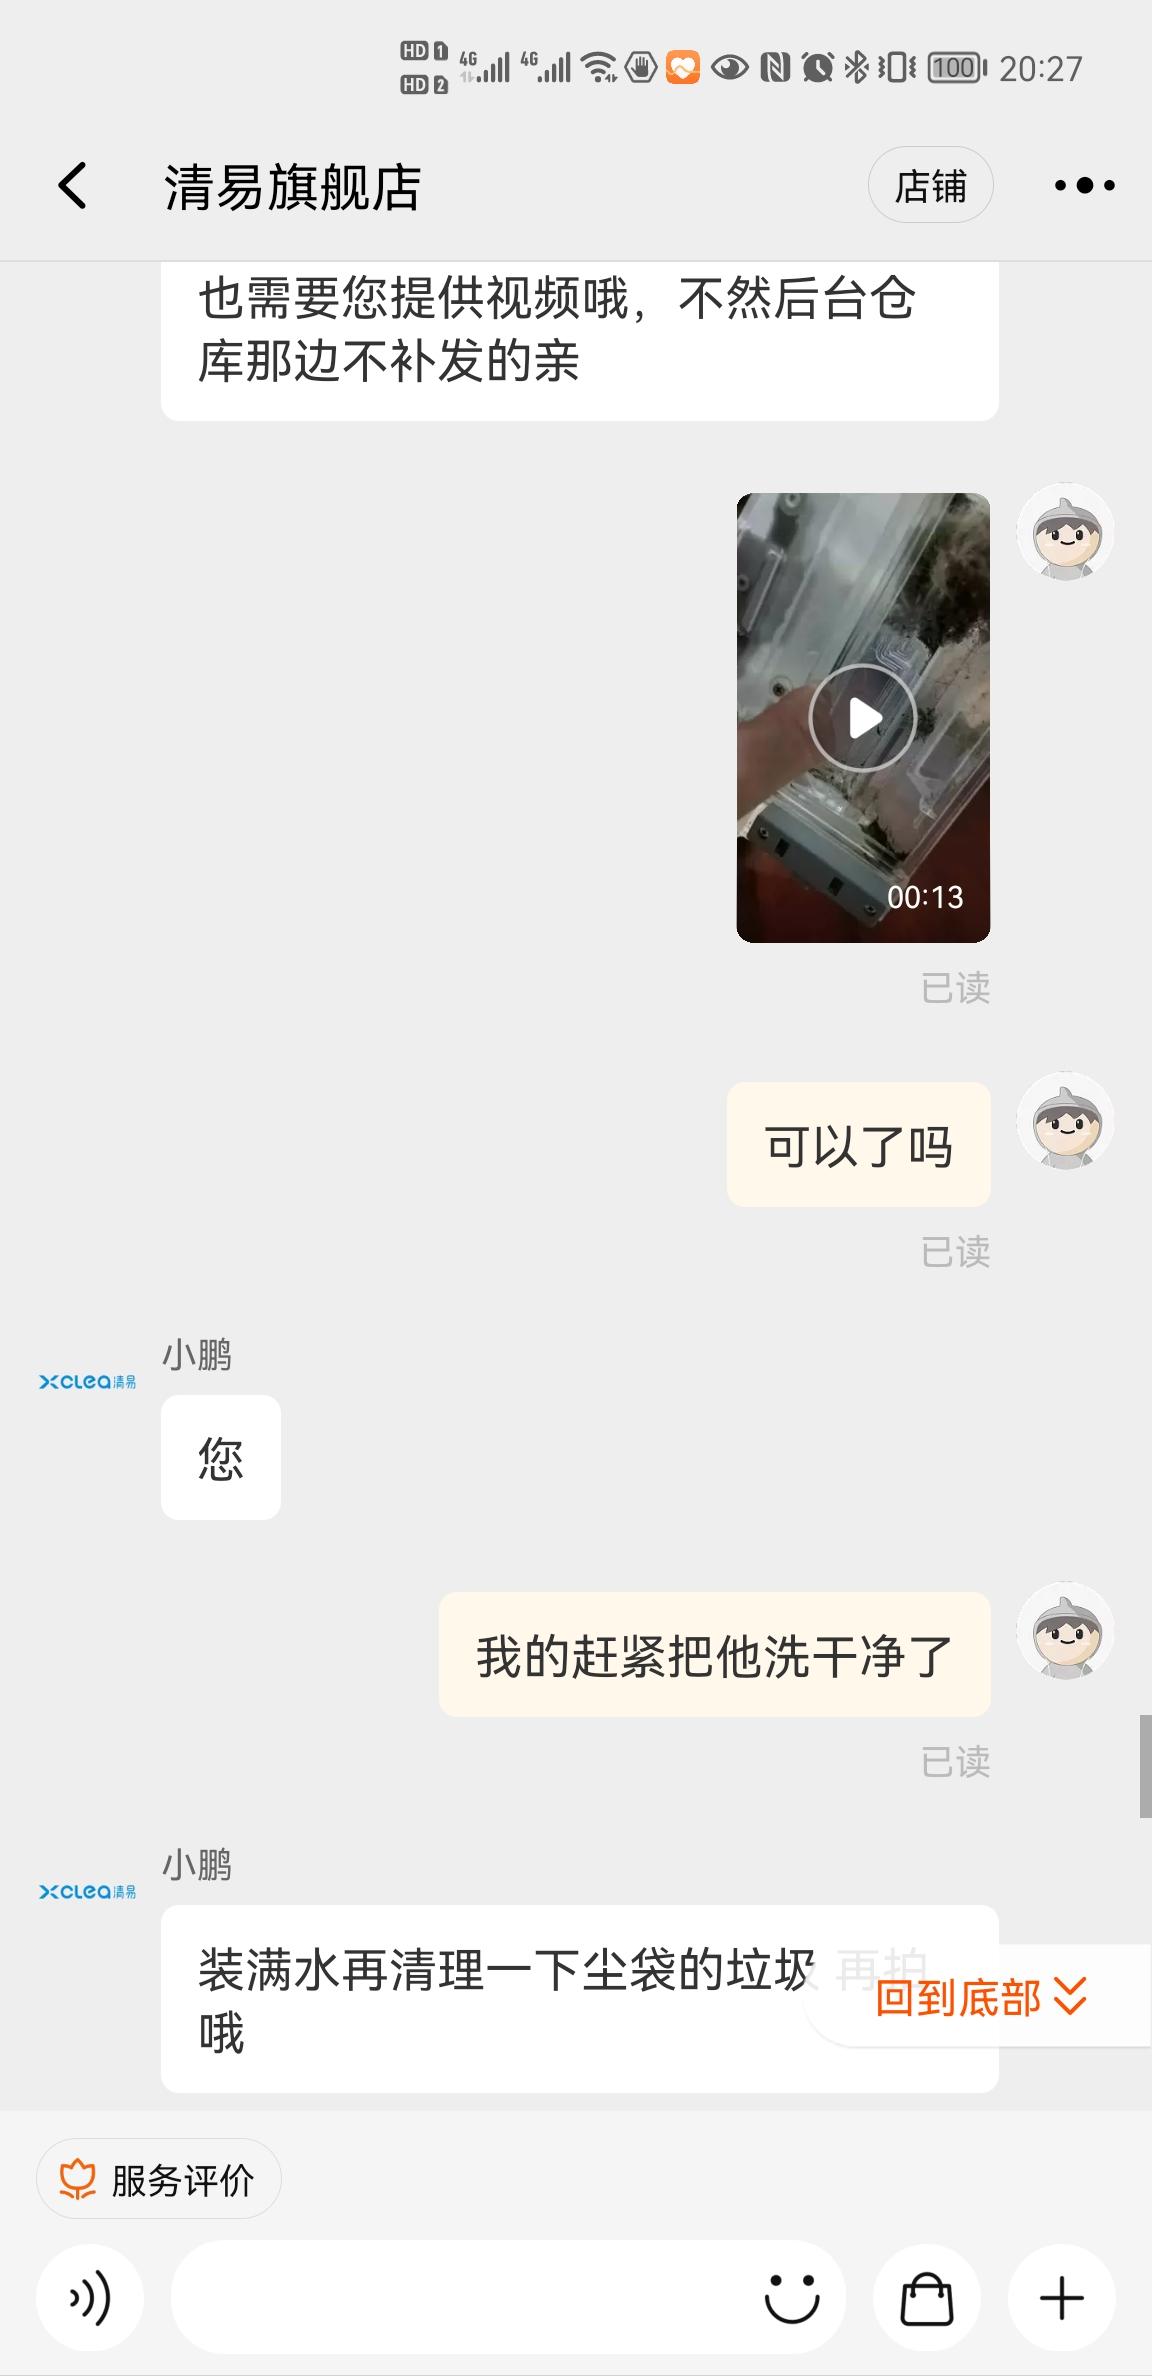 Screenshot_20210903_202755_com.taobao.taobao.jpg